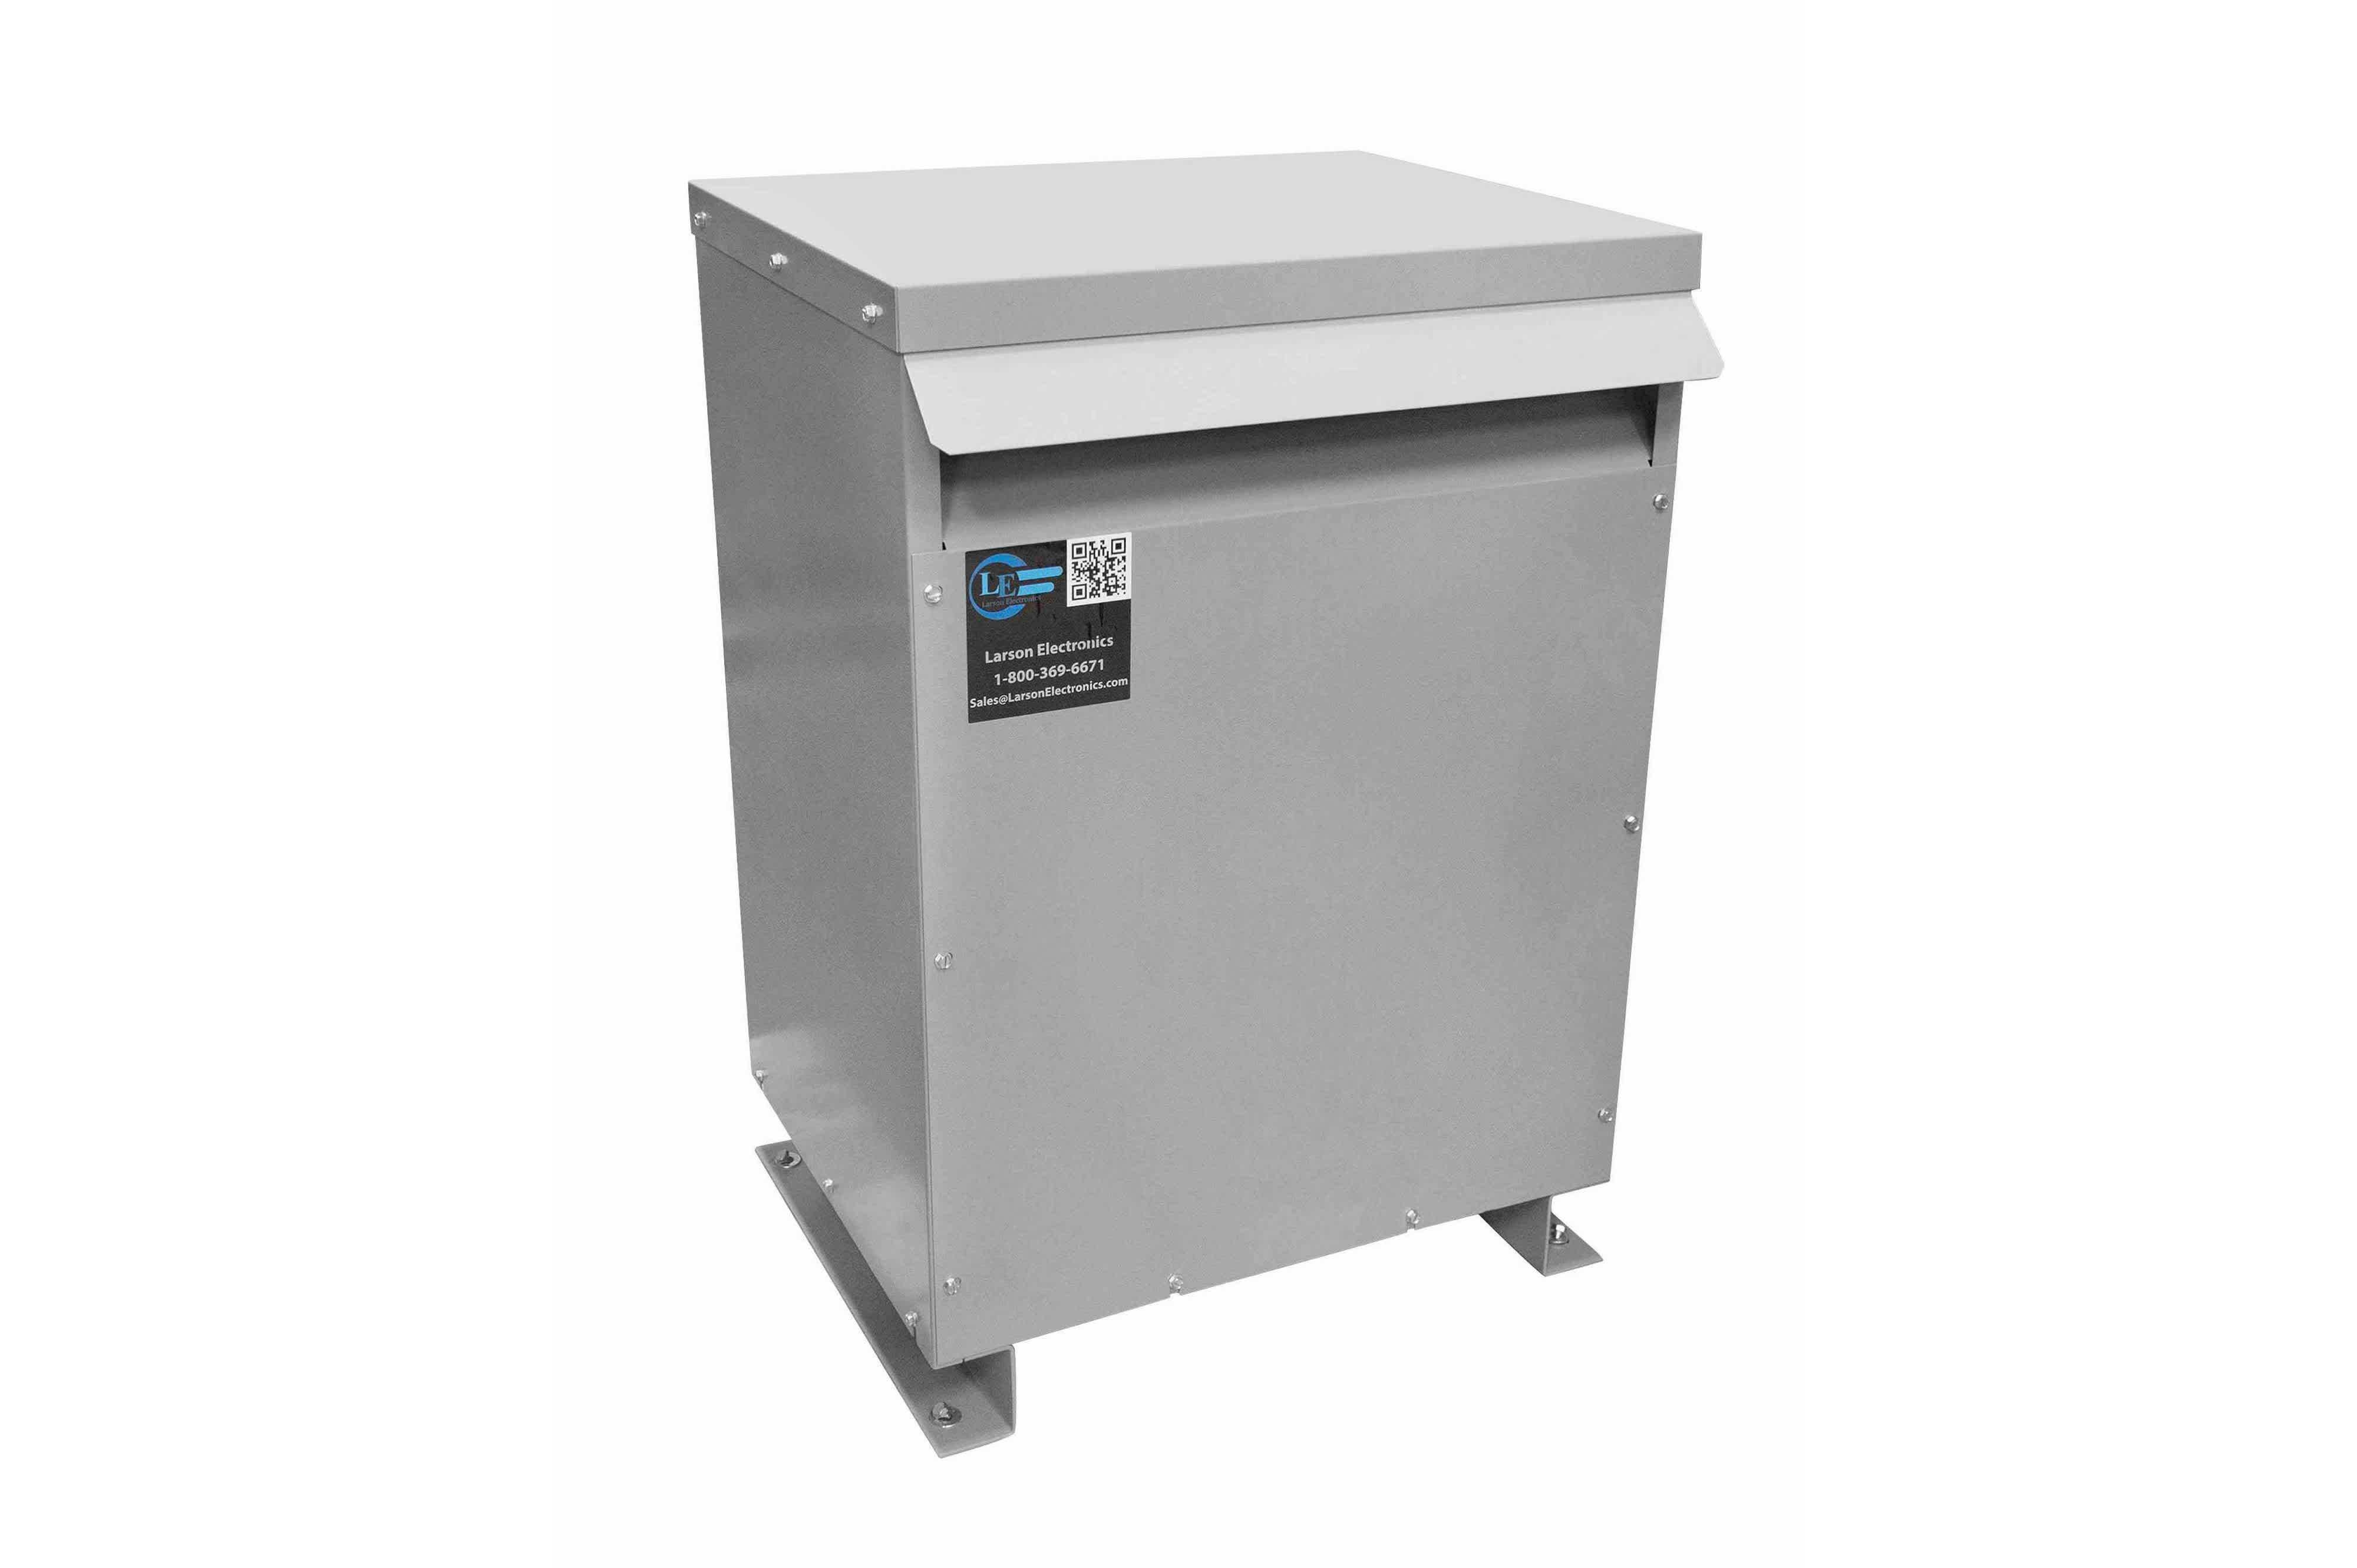 18 kVA 3PH DOE Transformer, 220V Delta Primary, 208Y/120 Wye-N Secondary, N3R, Ventilated, 60 Hz